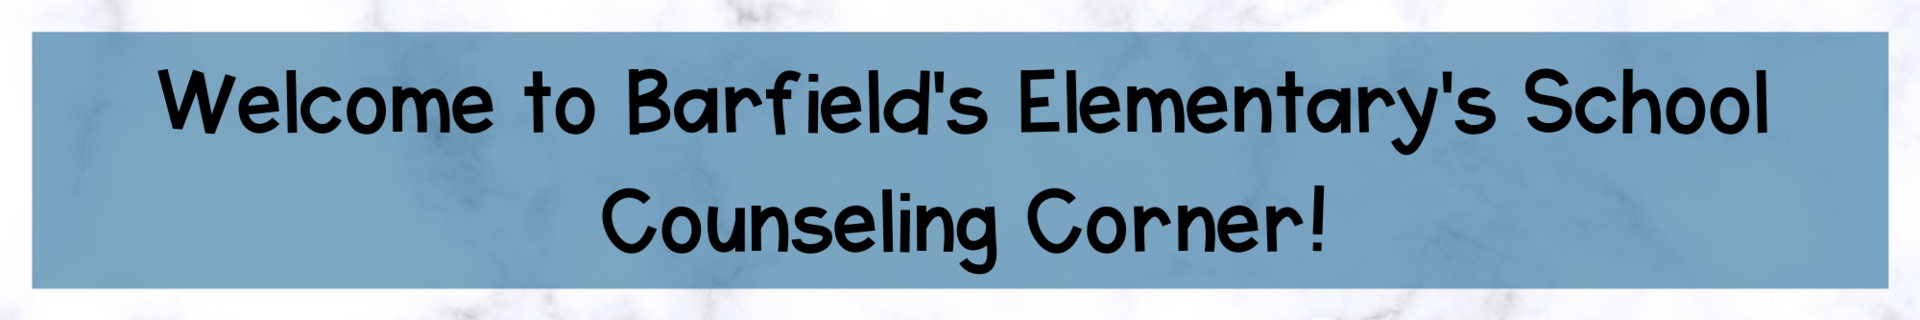 Barfield School Counseling Corner header